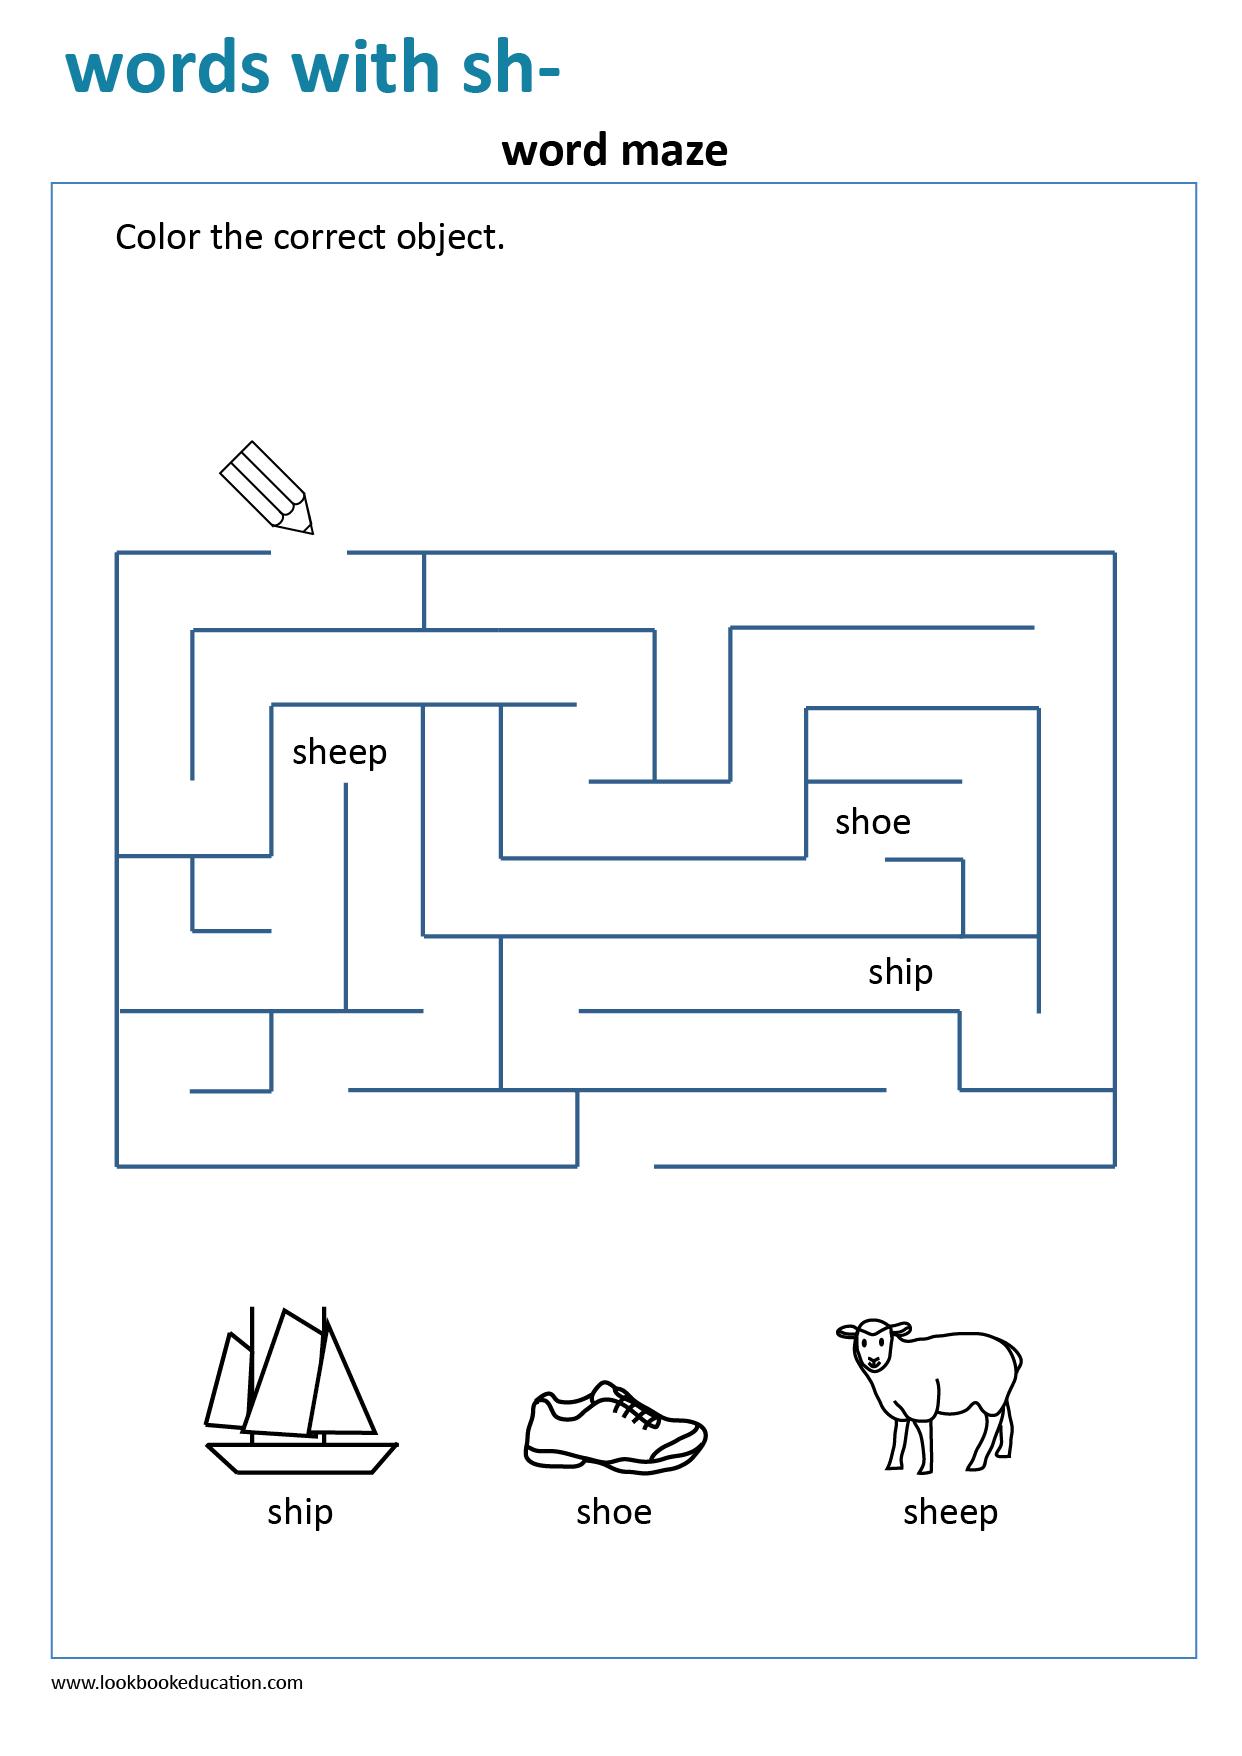 Words That Start With Sh Maze Worksheets Maze Worksheet Words [ 1756 x 1242 Pixel ]